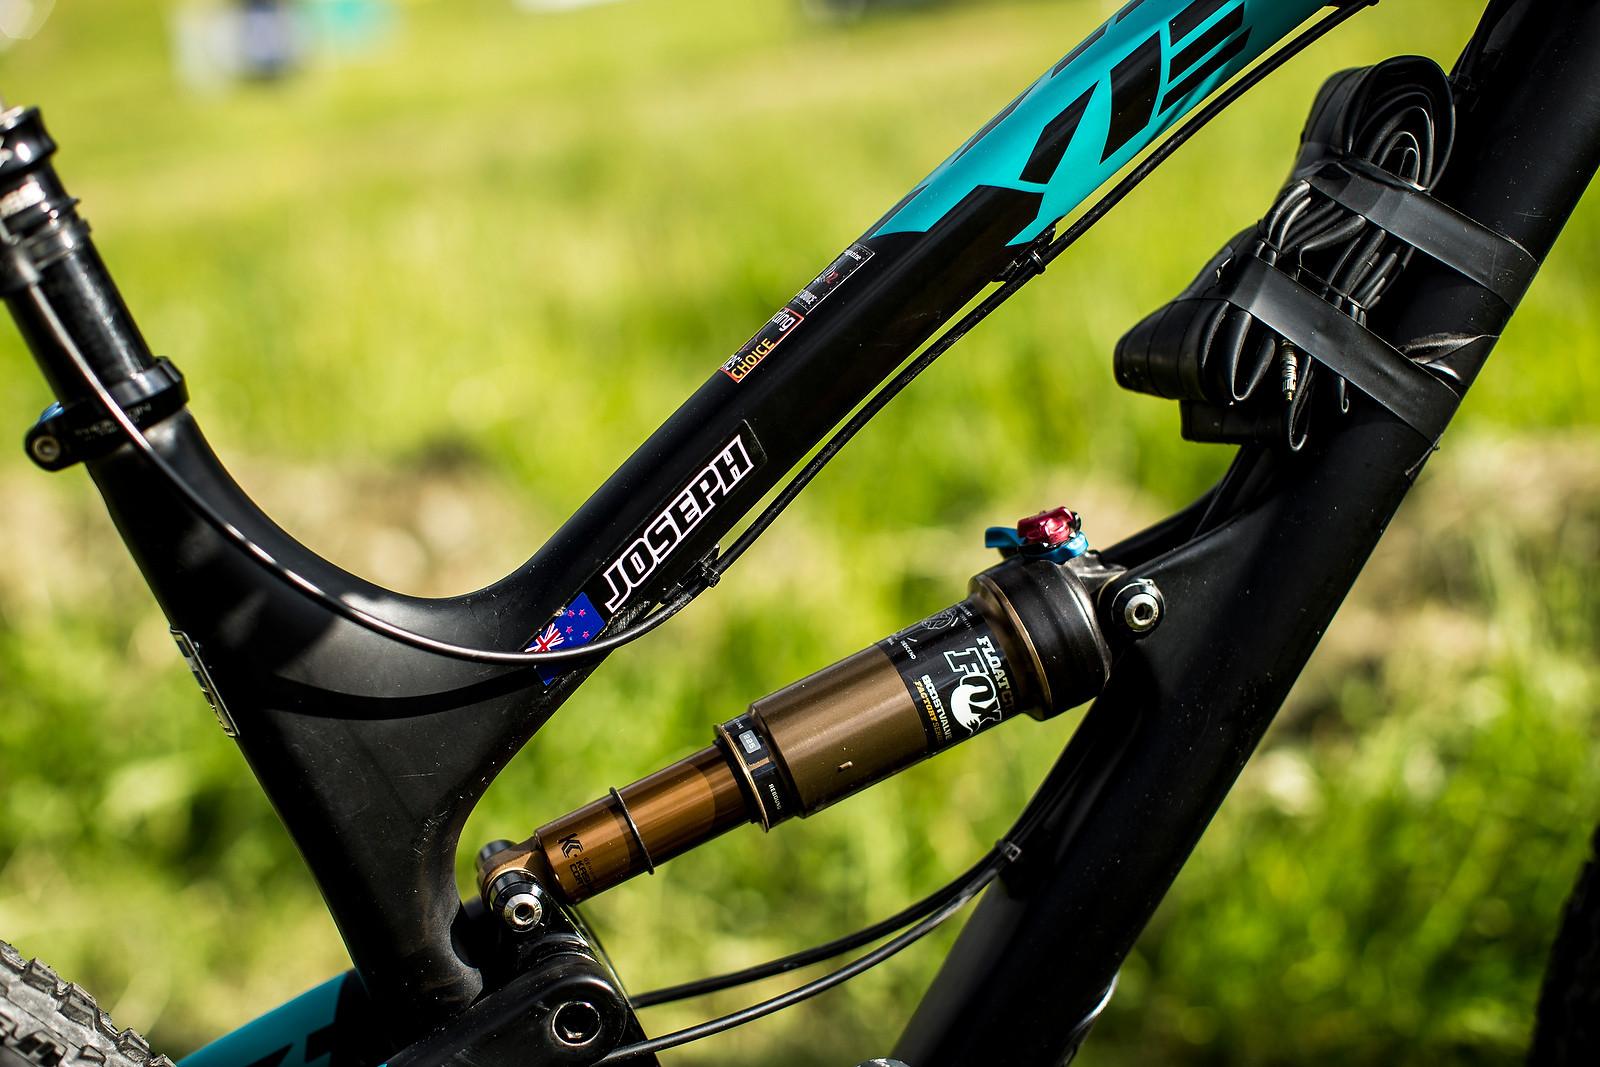 Rosara Joseph's Yeti SB66c at Val d'Allos Enduor World Series - Pit Bits: Enduro World Series Val d'Allos, France - Mountain Biking Pictures - Vital MTB